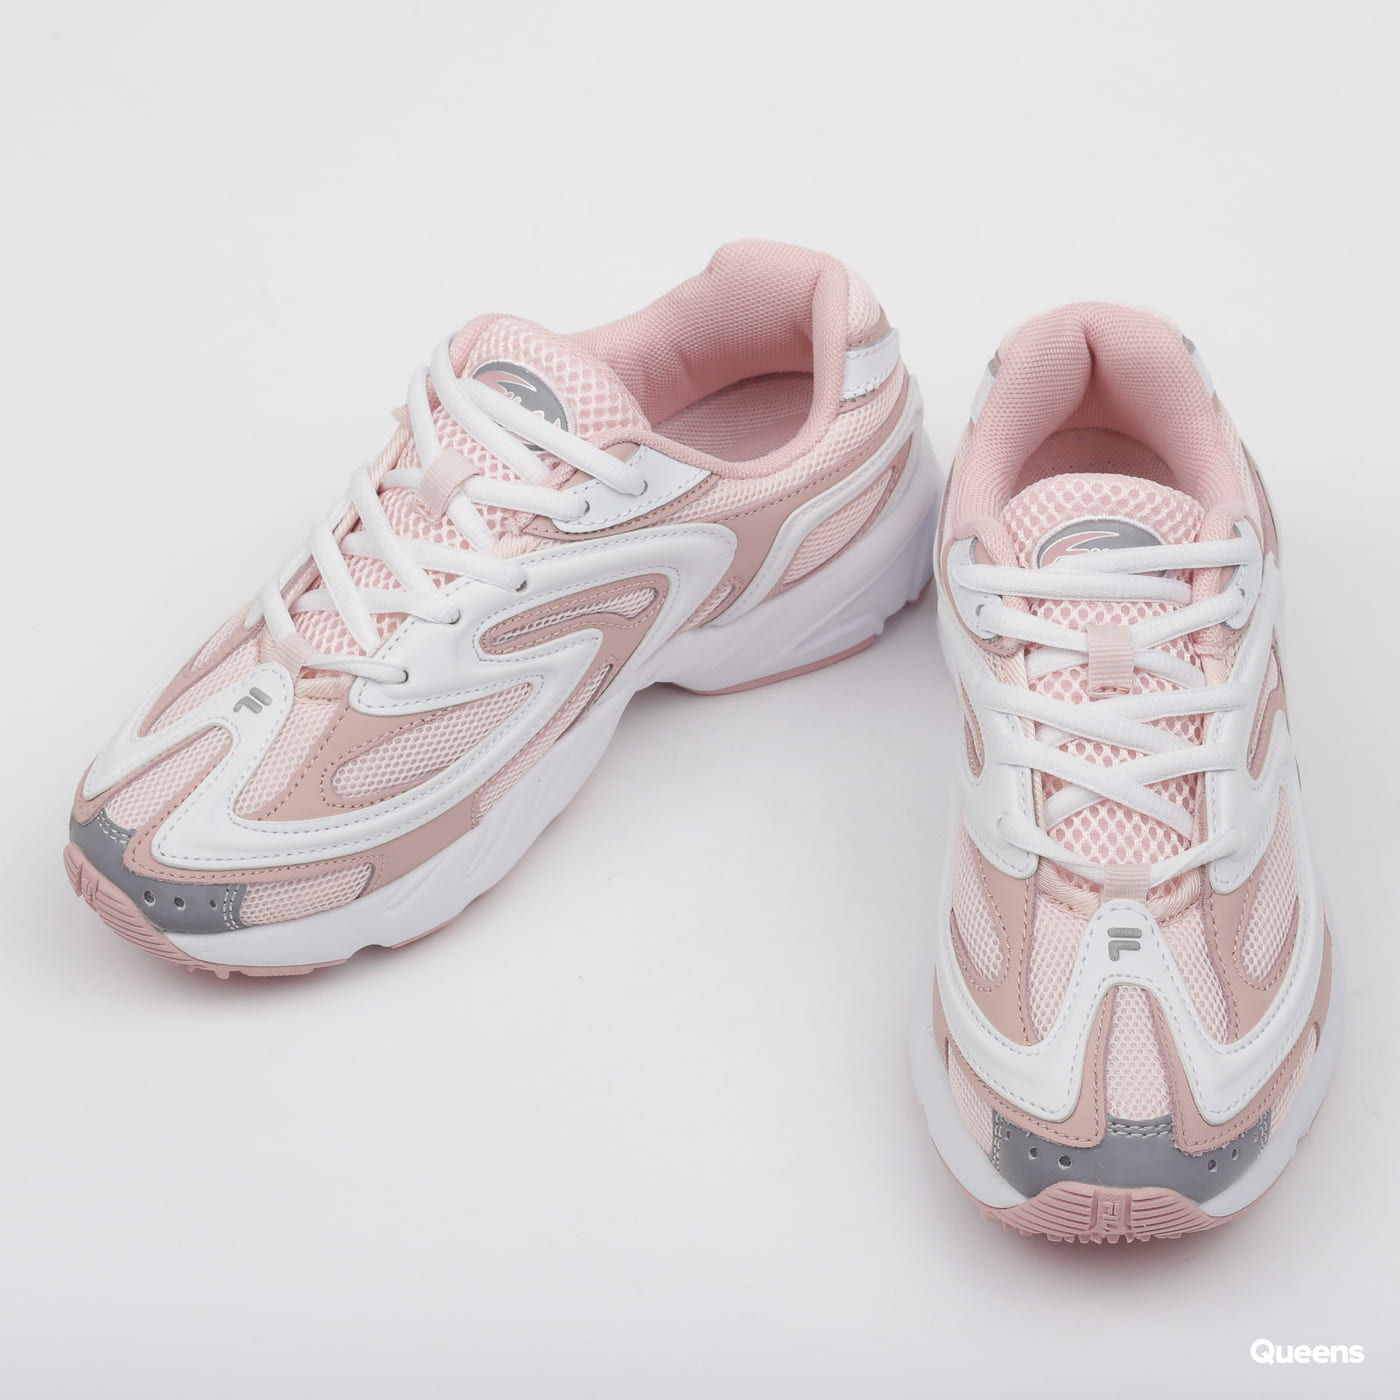 Fila Creator WMN silver pink / white / crystal pink